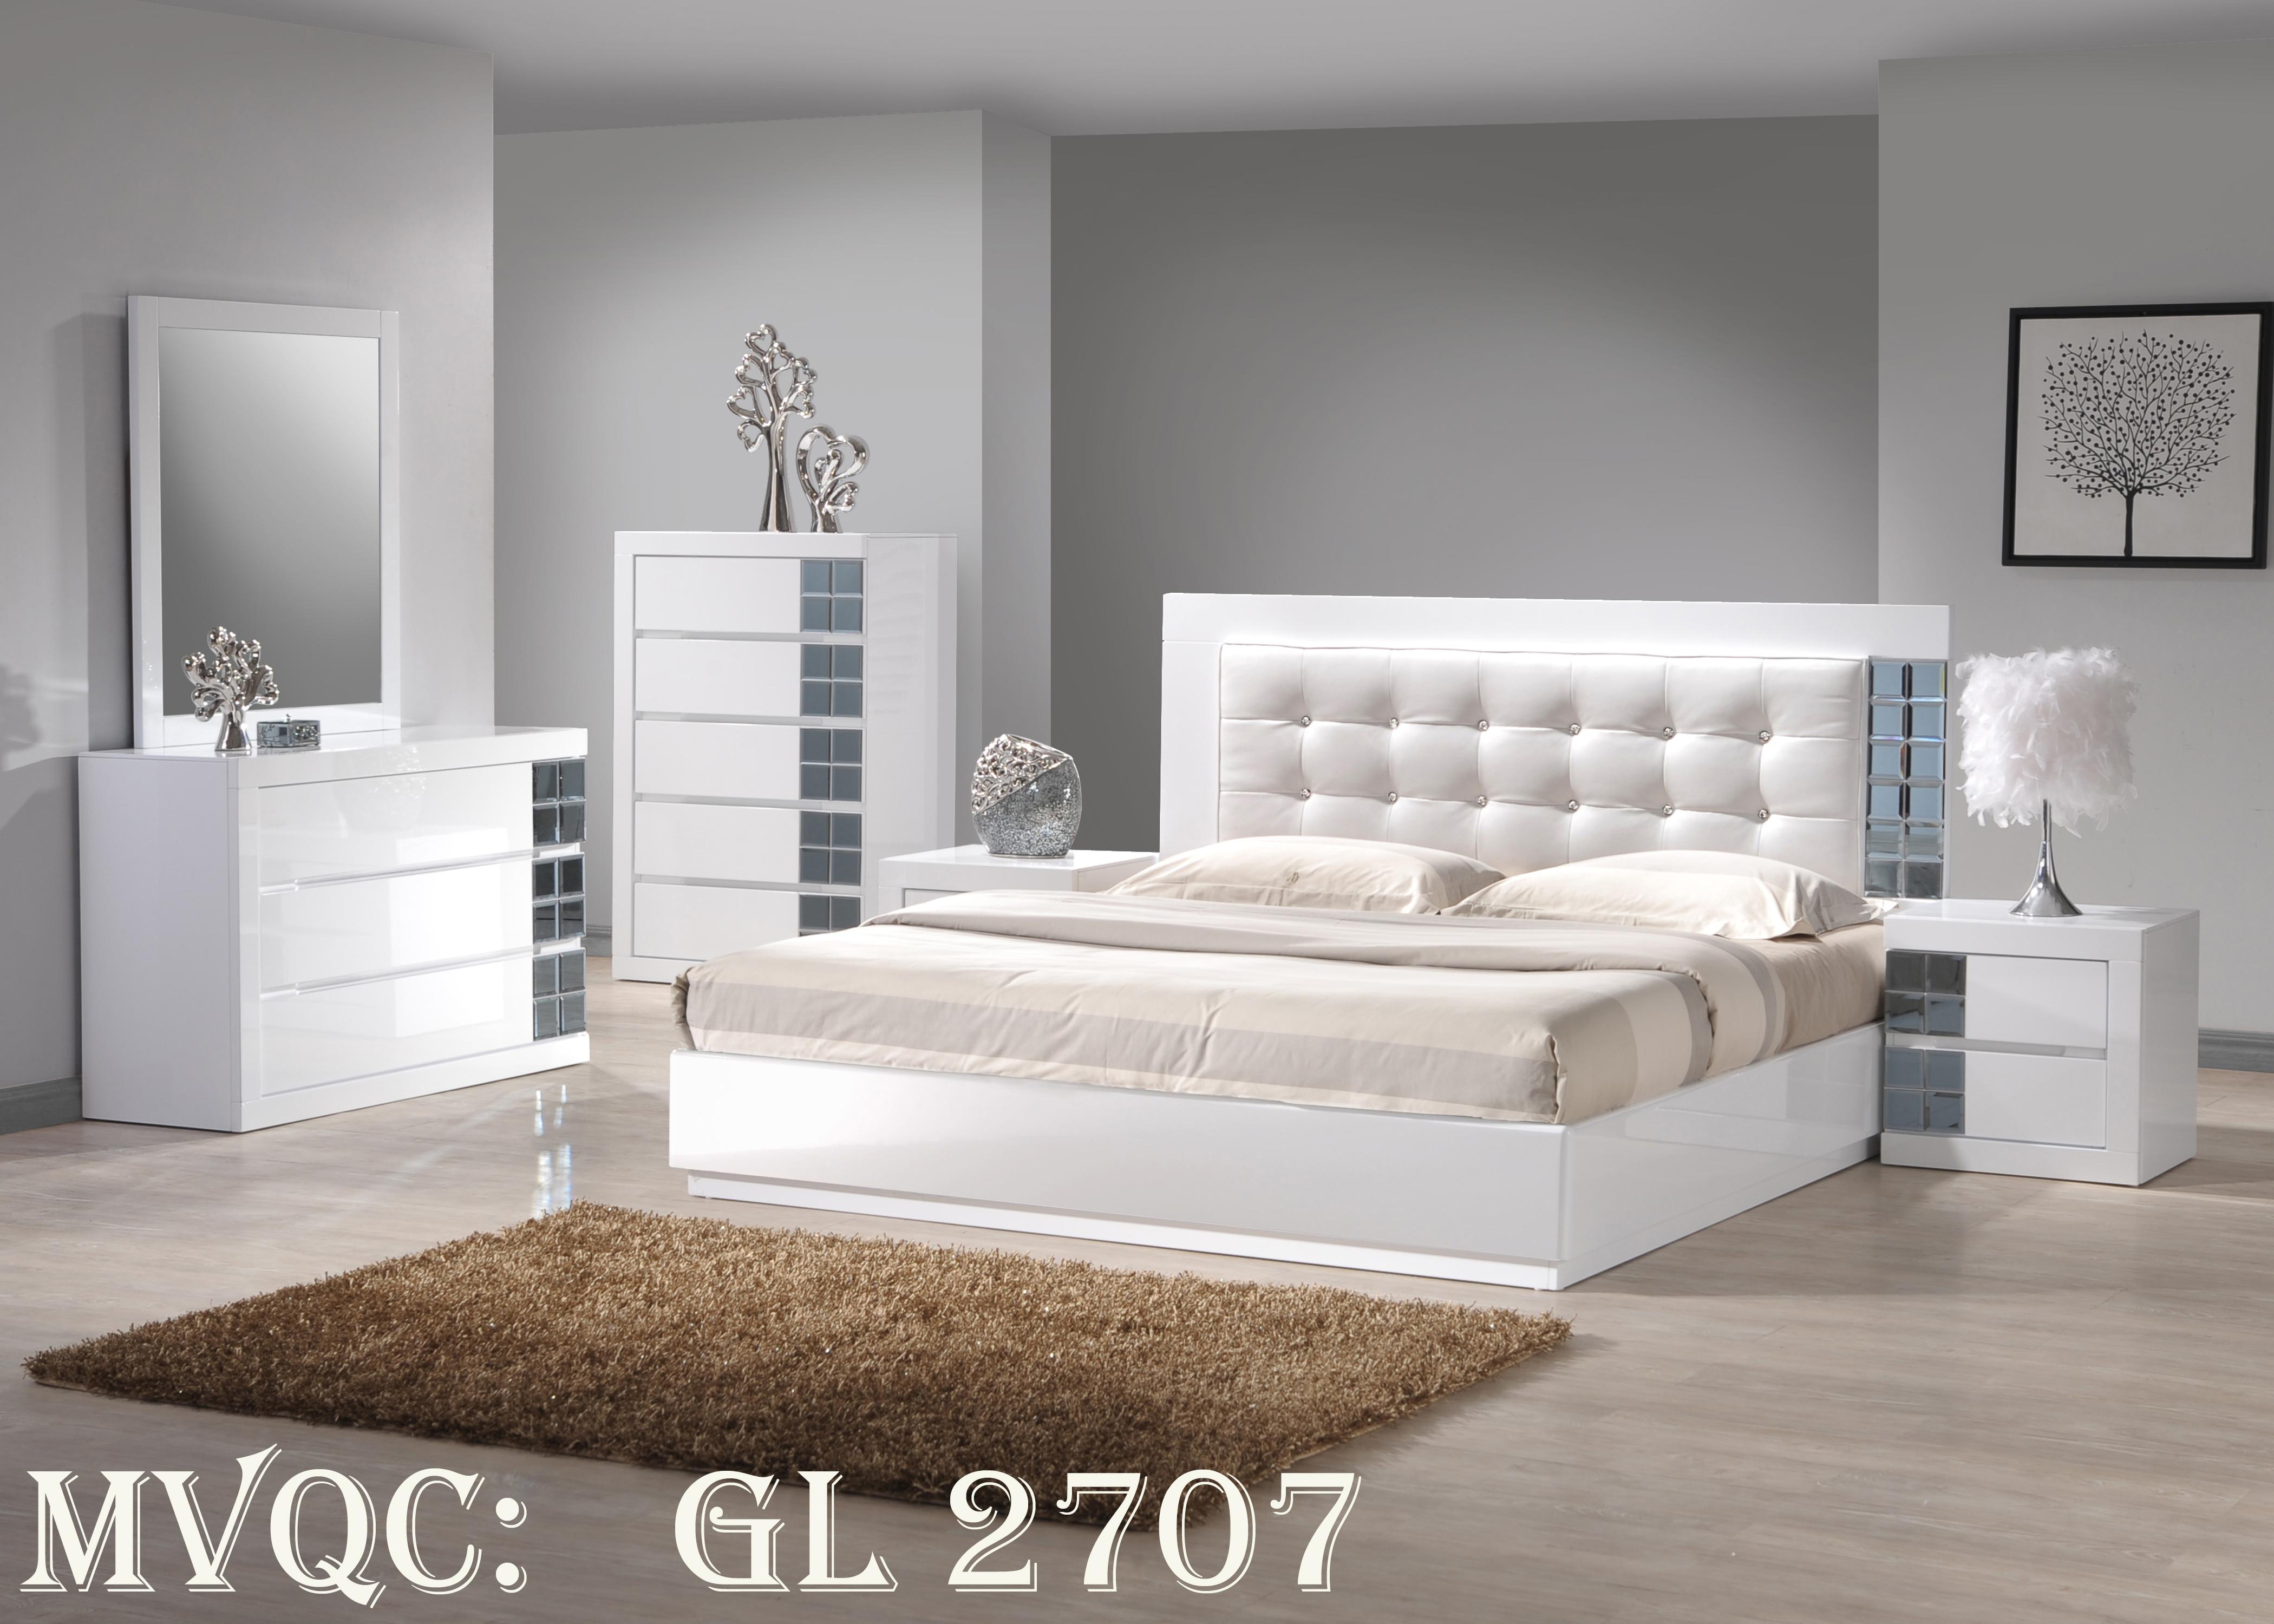 GL 2707